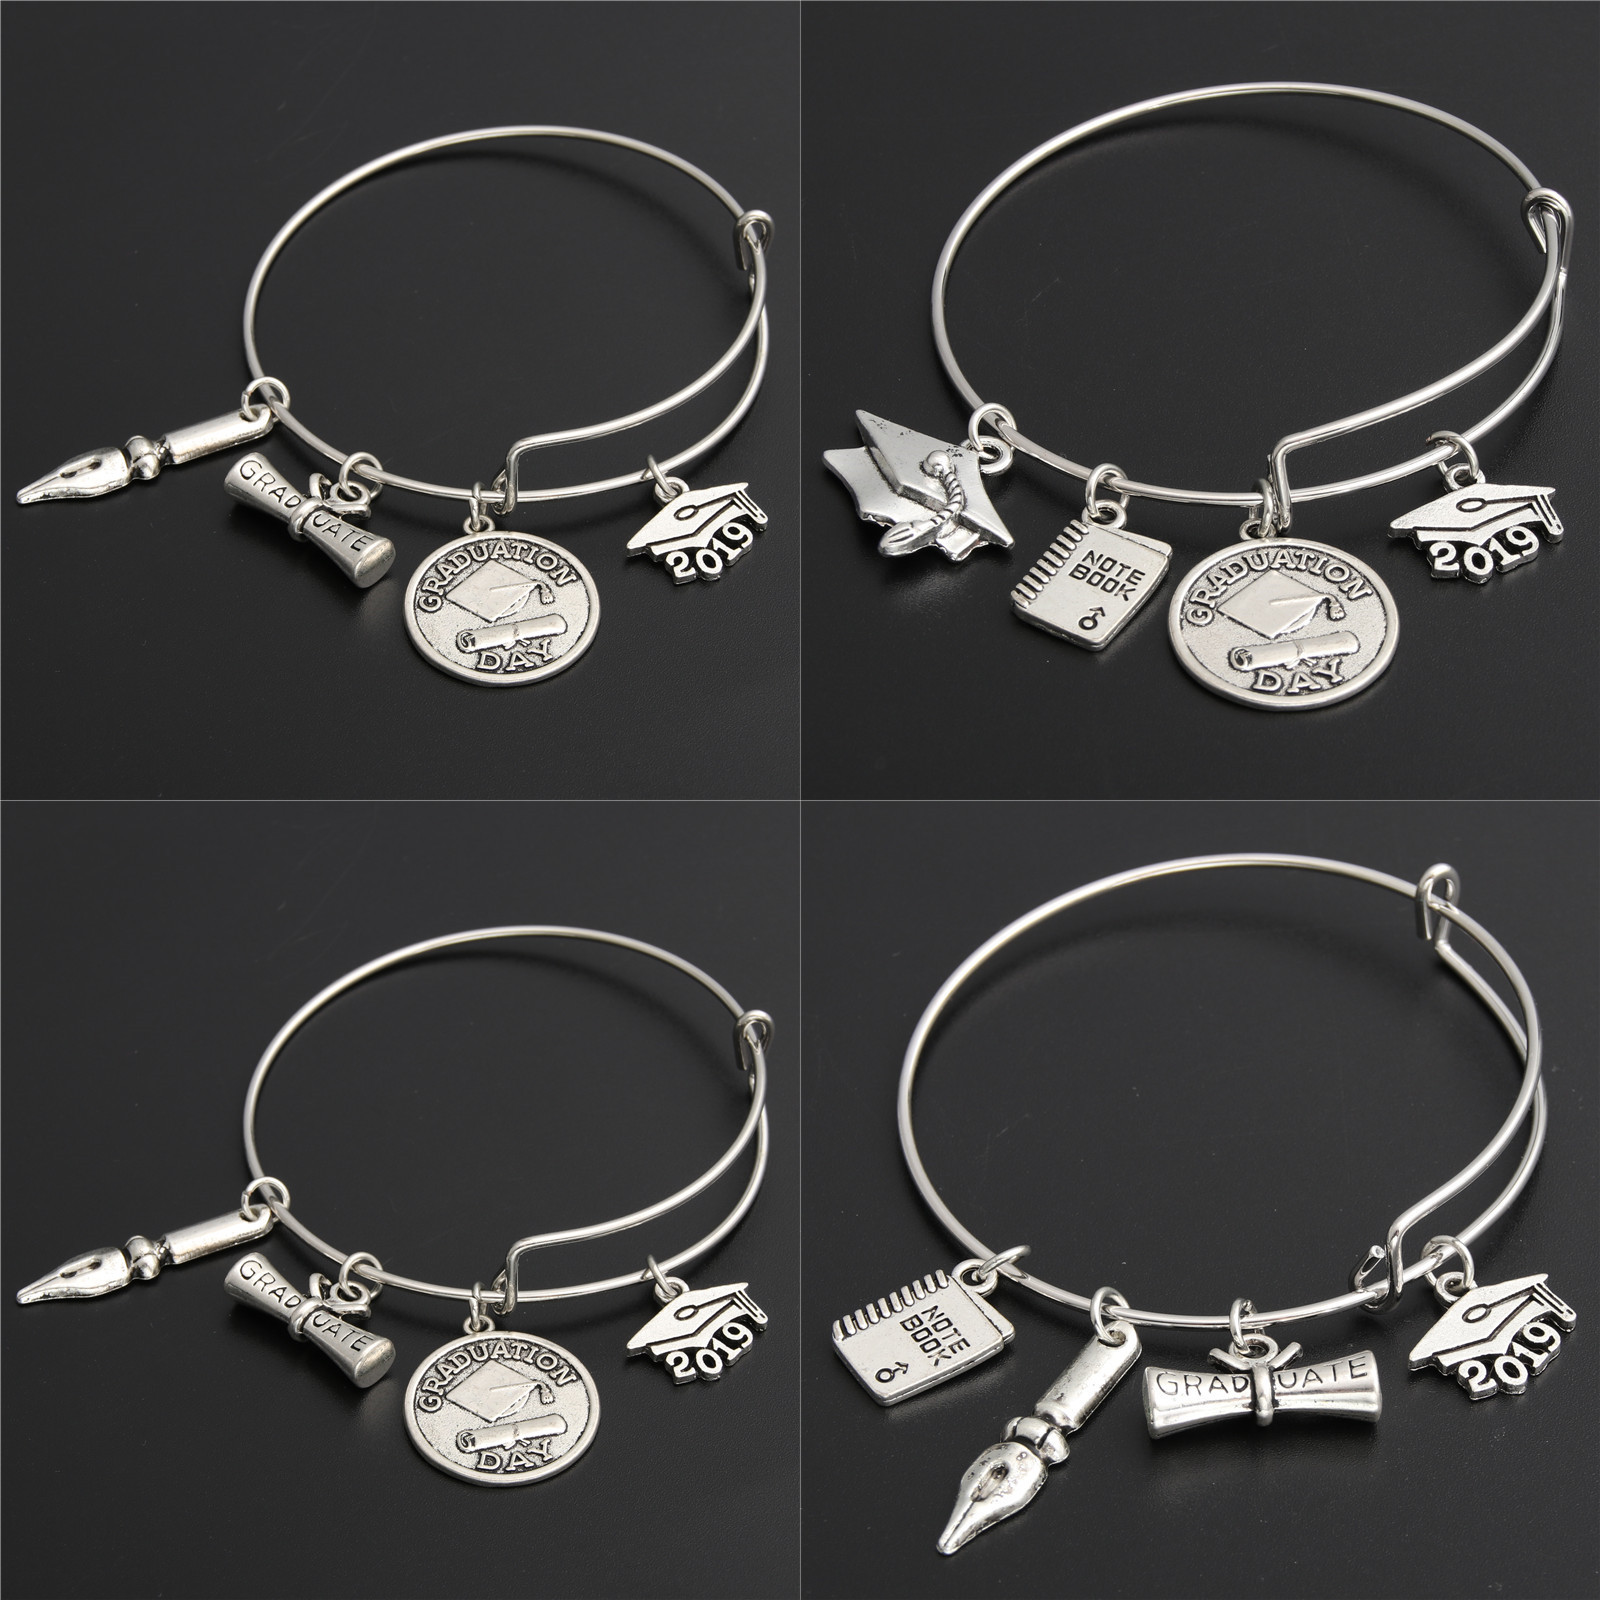 1pc Jewelry 2019 Graduation Bracelet Expandable Wire Bangle Snap Button Bracelets For College Graduation Gifts